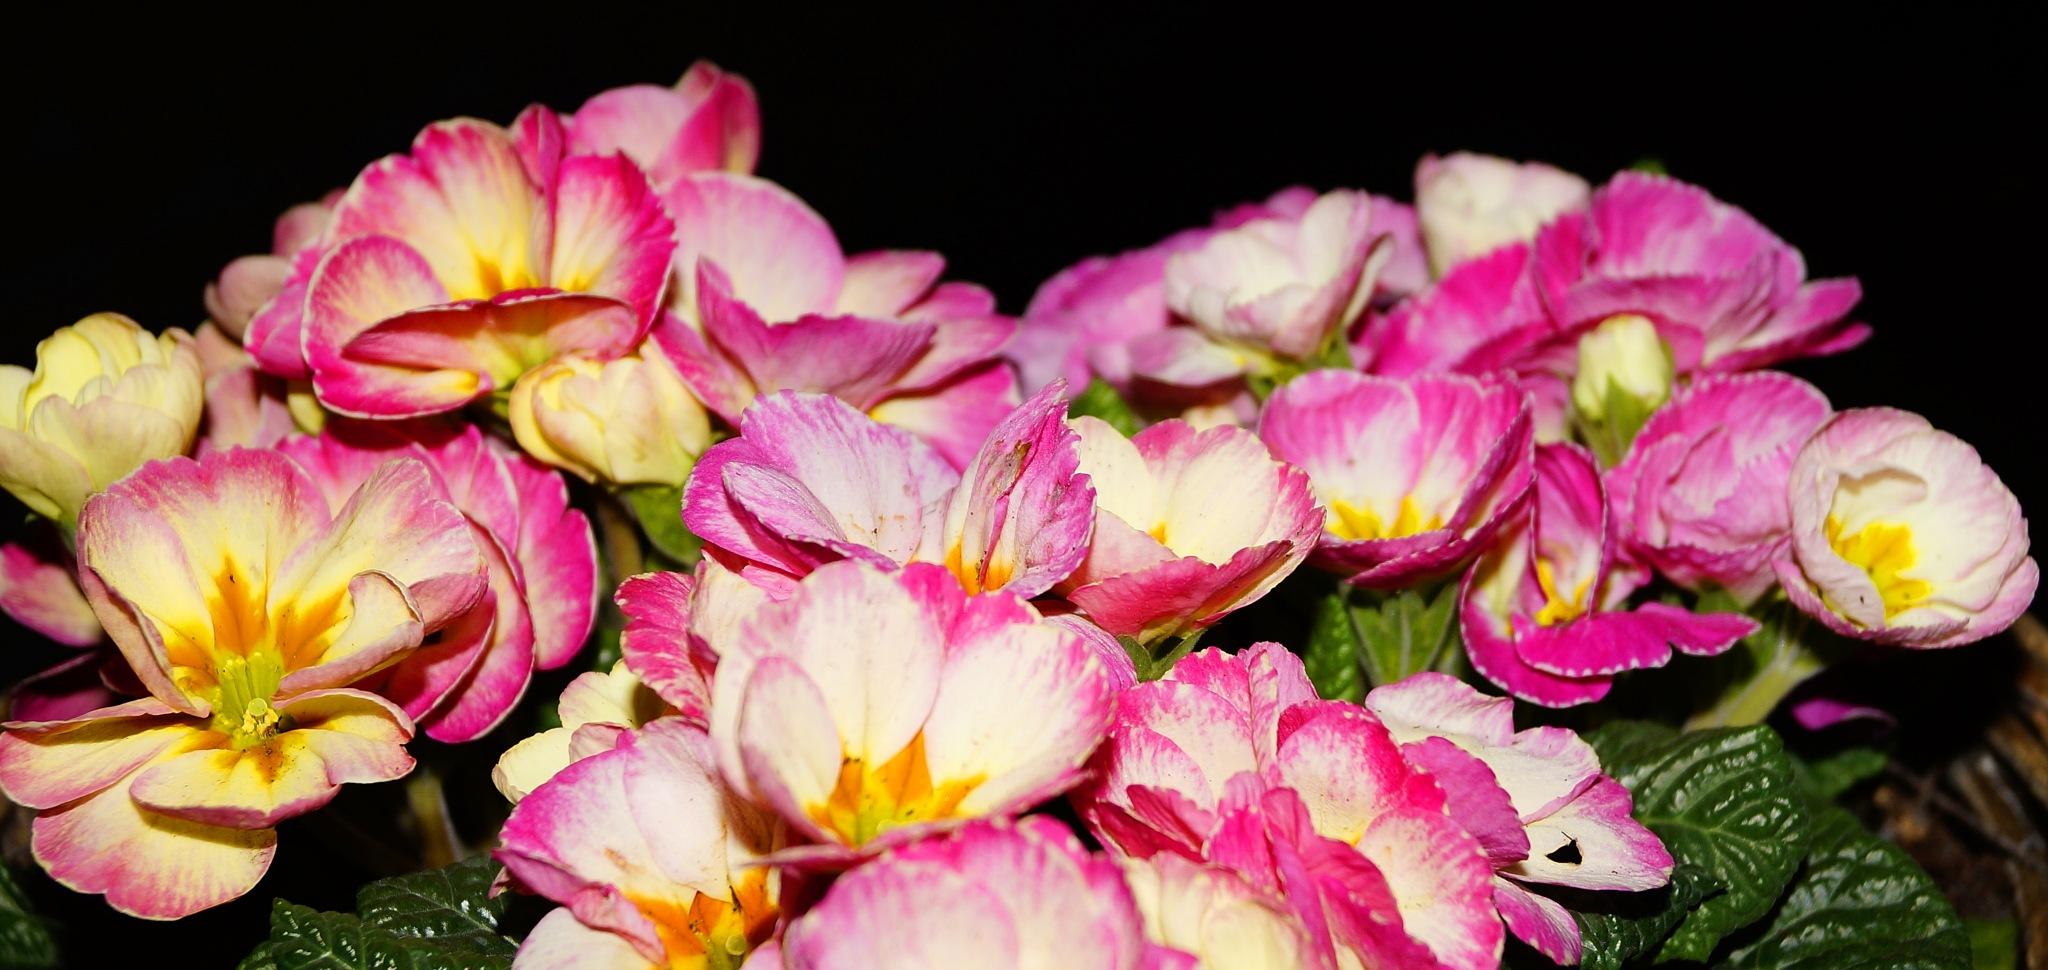 Primula by Marian Baay